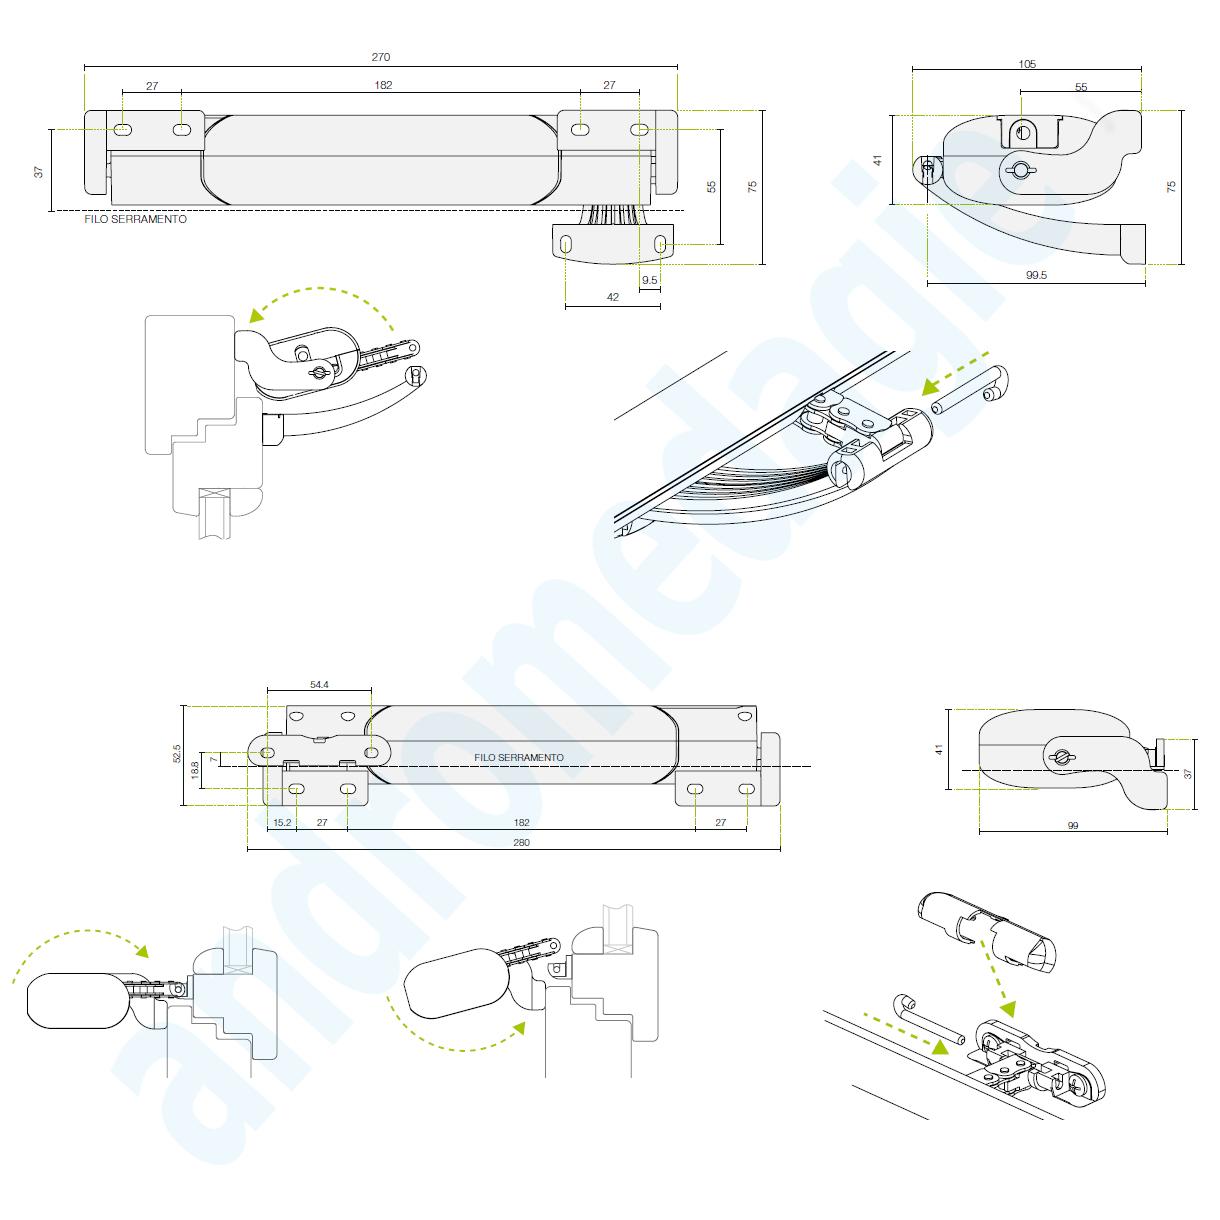 Actuator Smart Electric Window Openers Chain Top Bottom